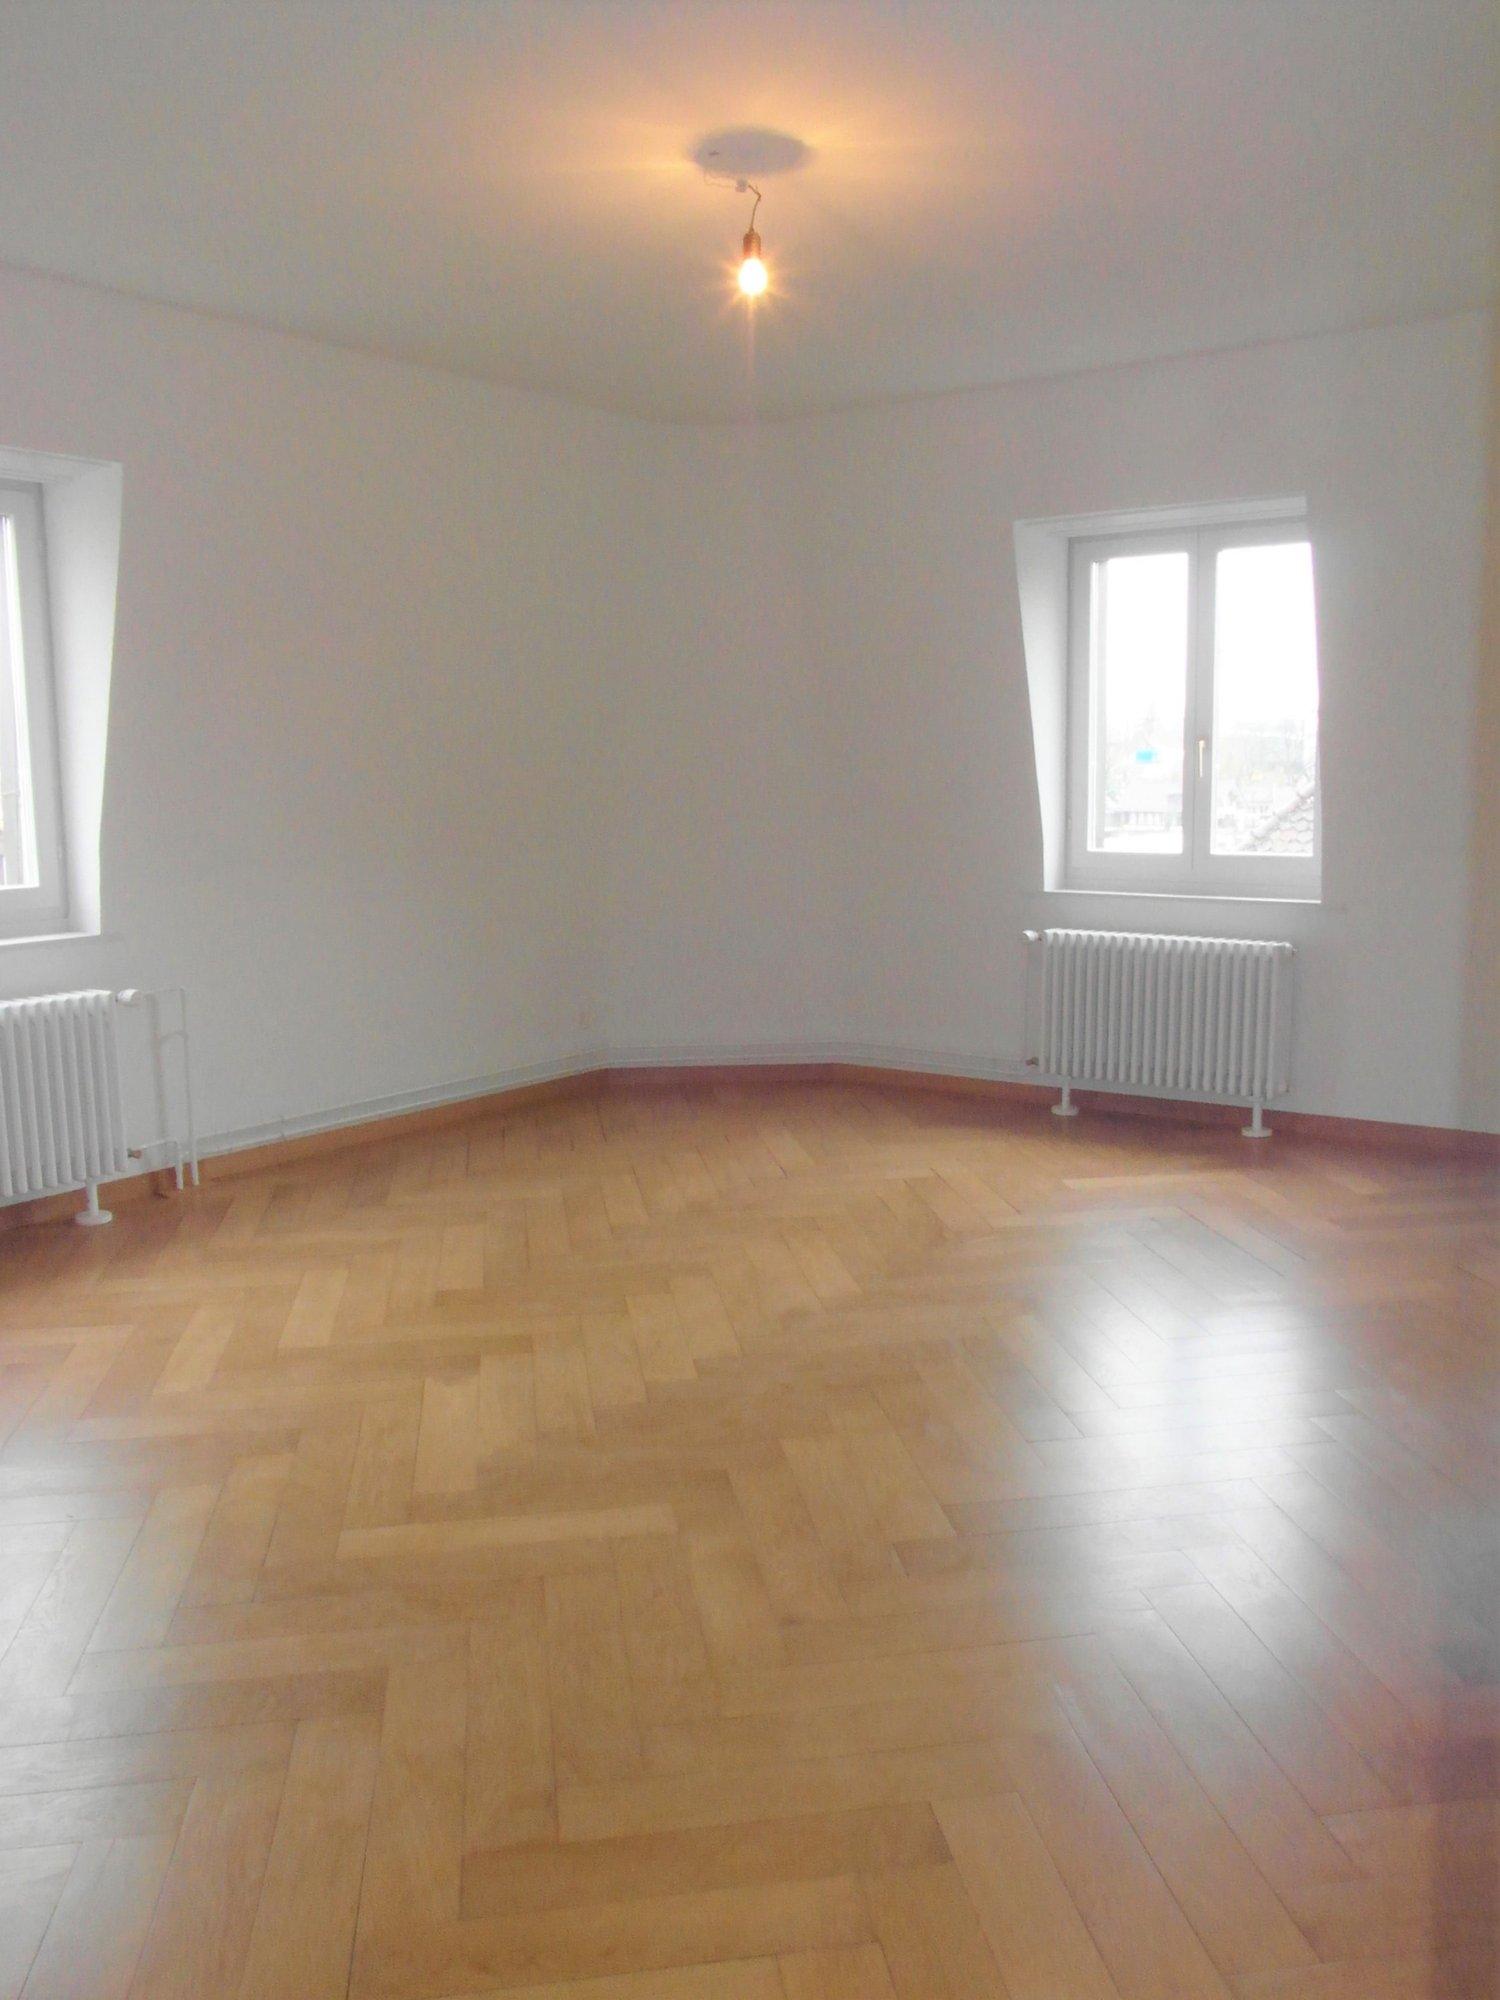 Sahlistrasse 51